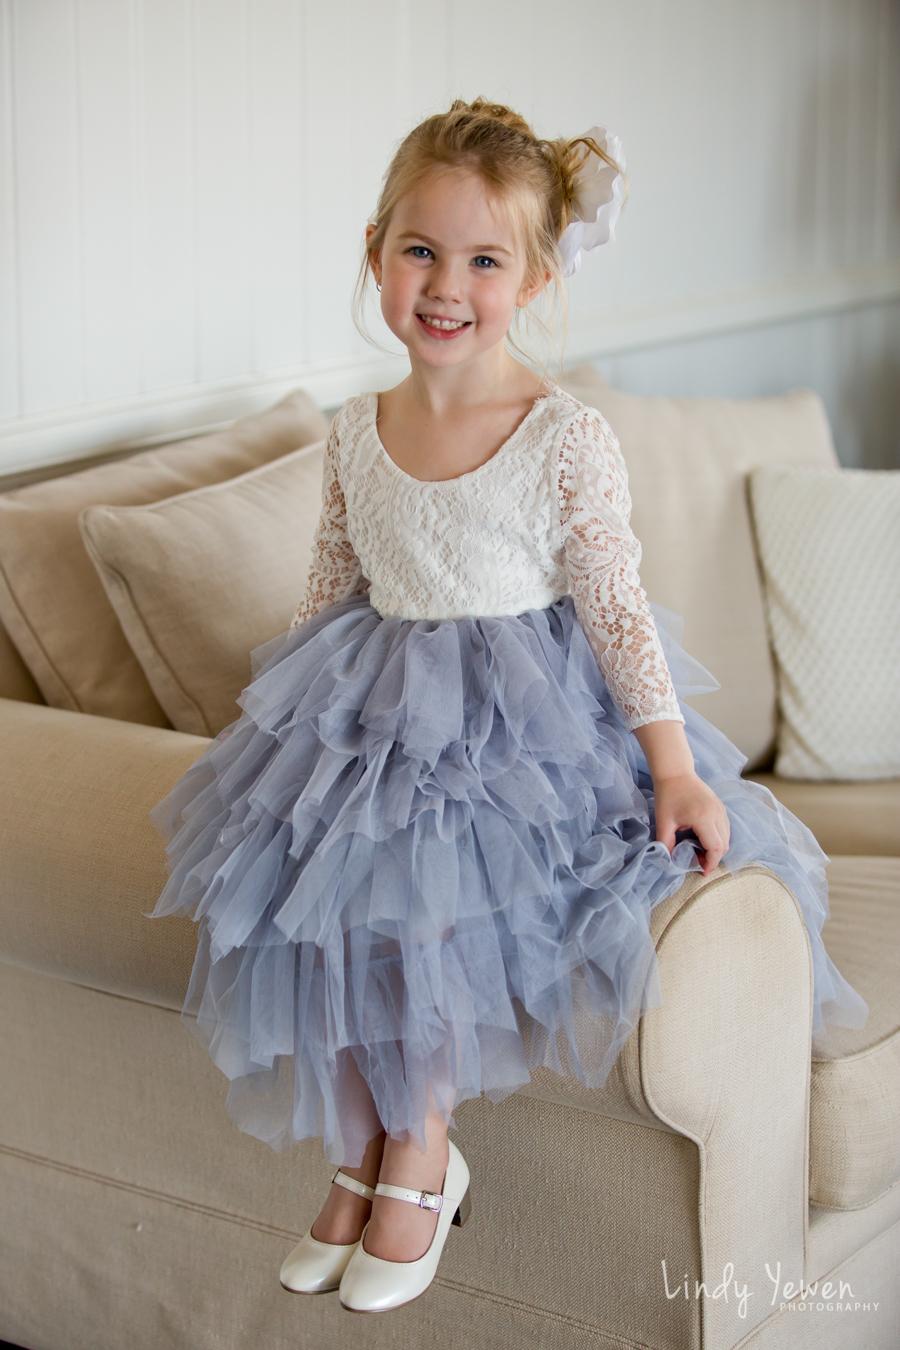 Montville-wedding-photographer-Lauren-Kirby 20.jpg